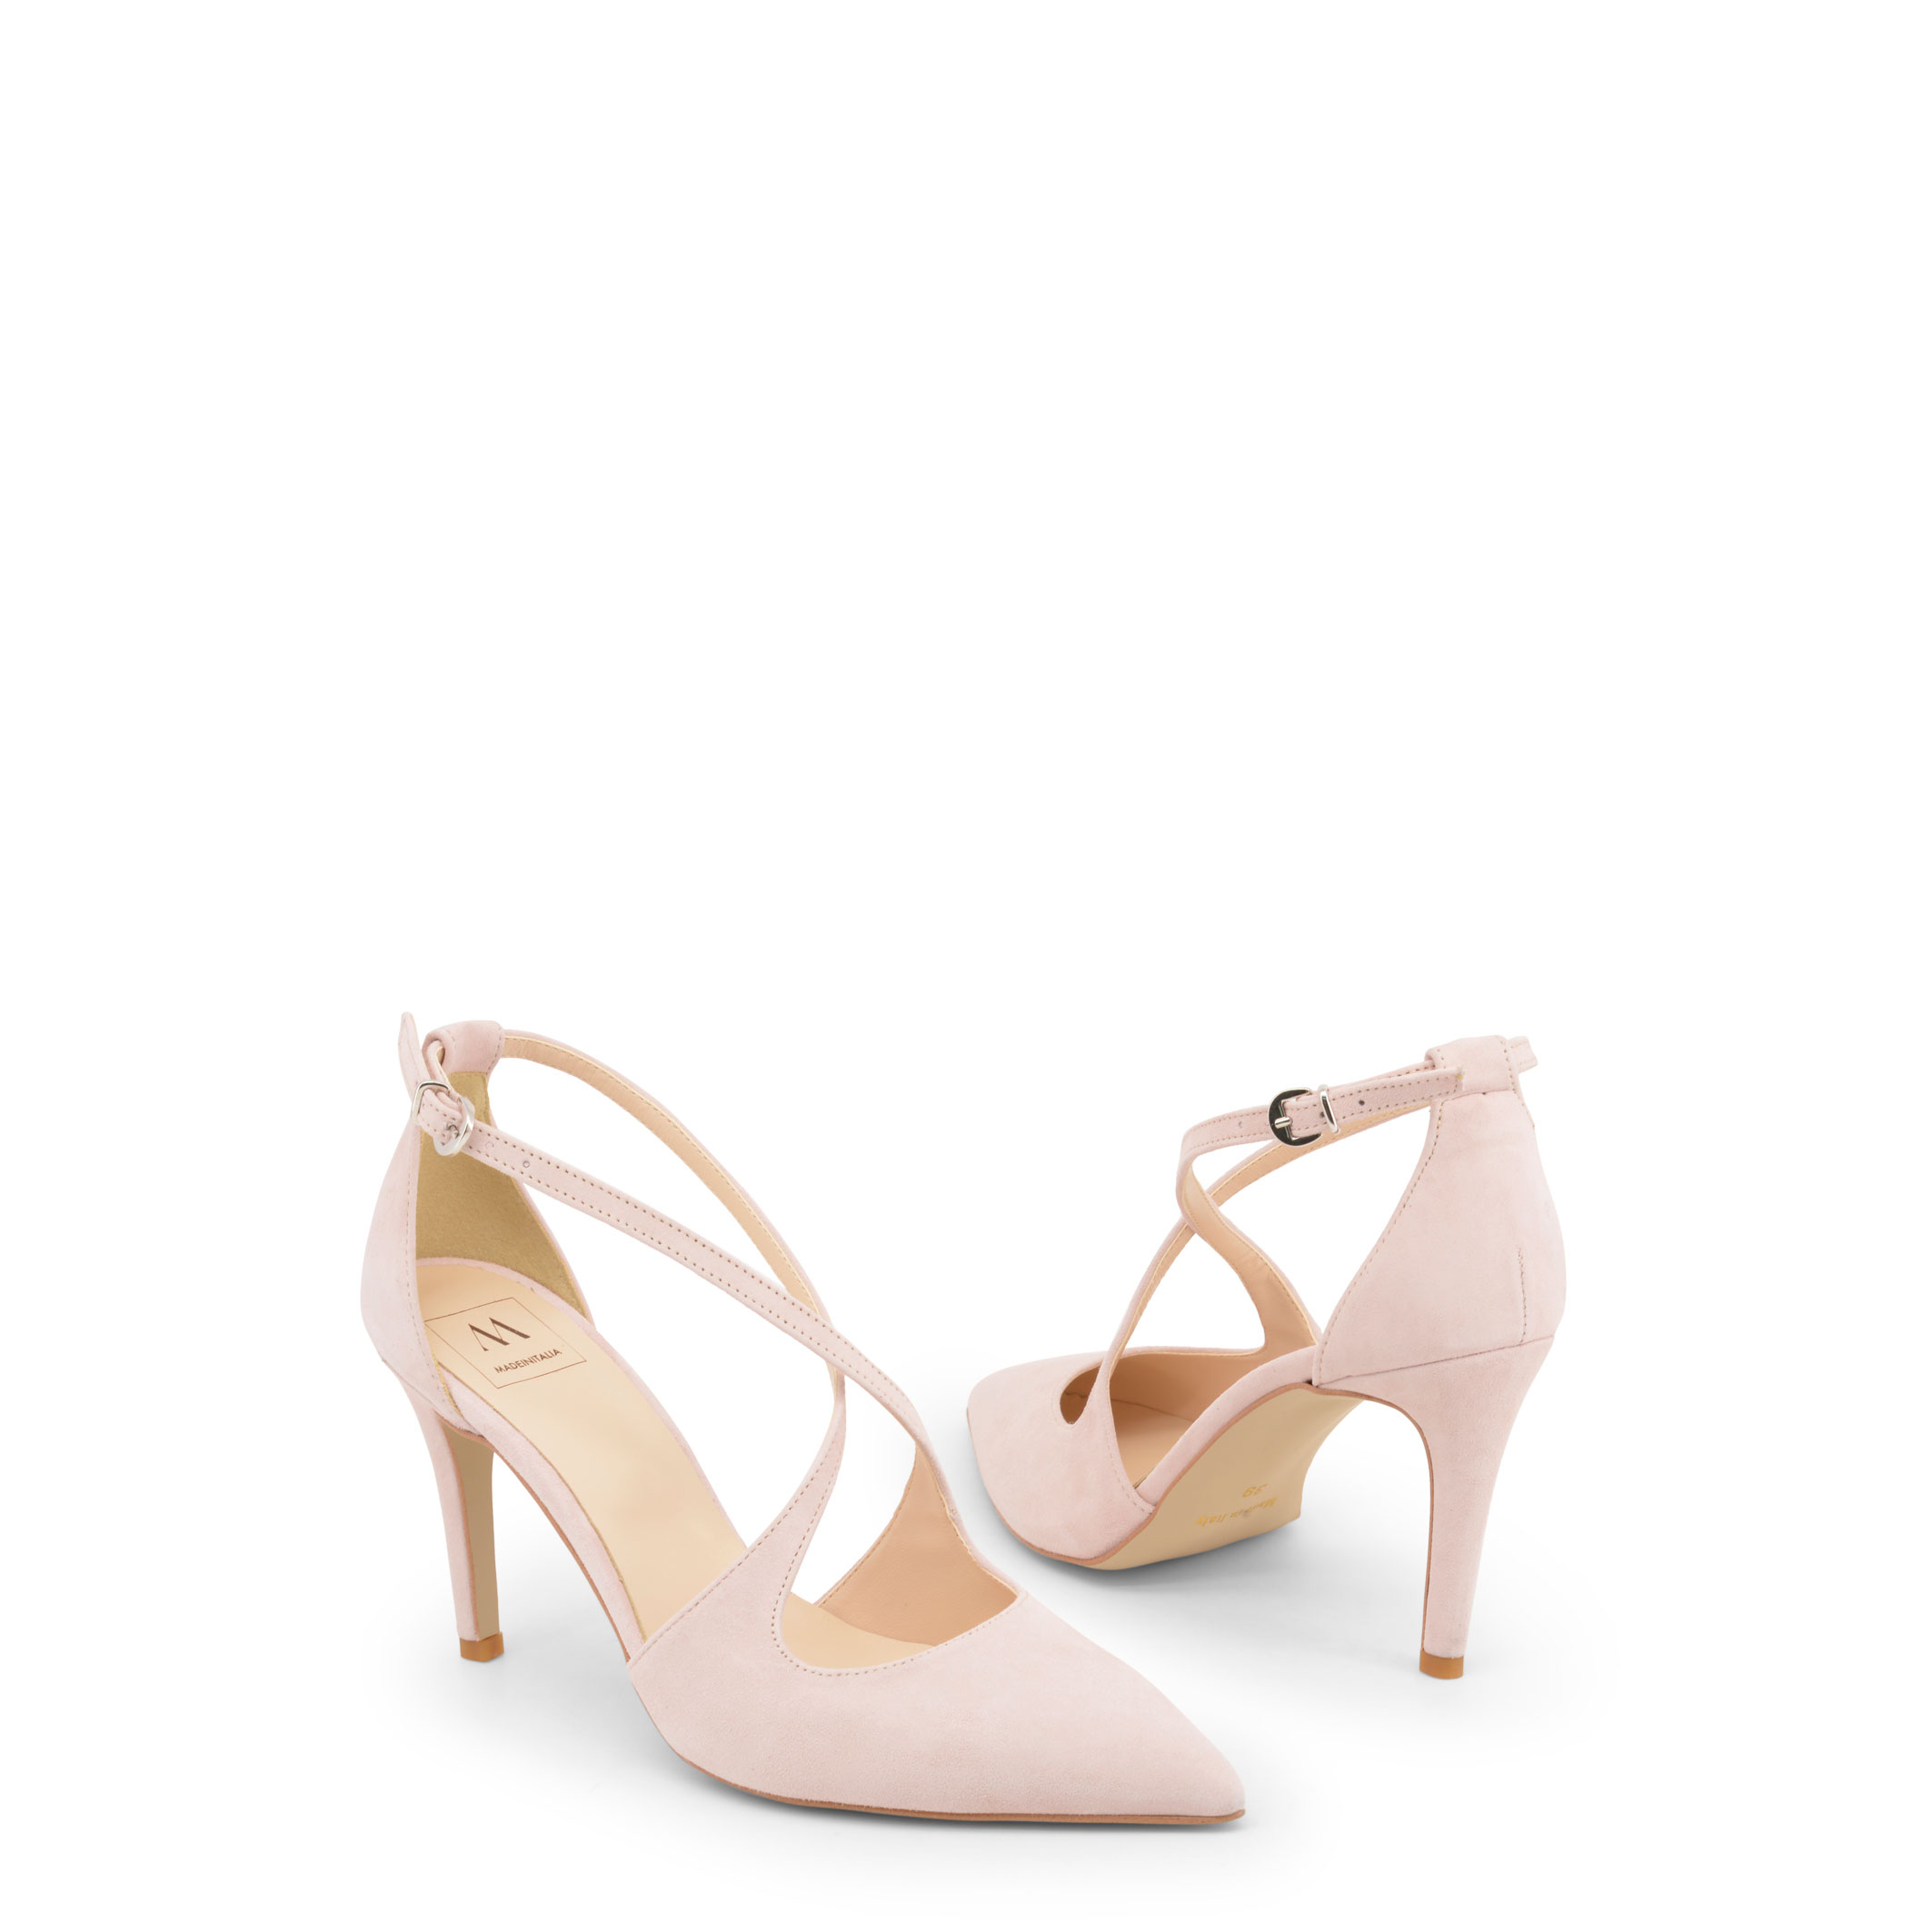 Zapatos-Made-in-Italia-Mujer-AMERICA-Sandalias-Marron-Azul-Rosa-cuna-tacon